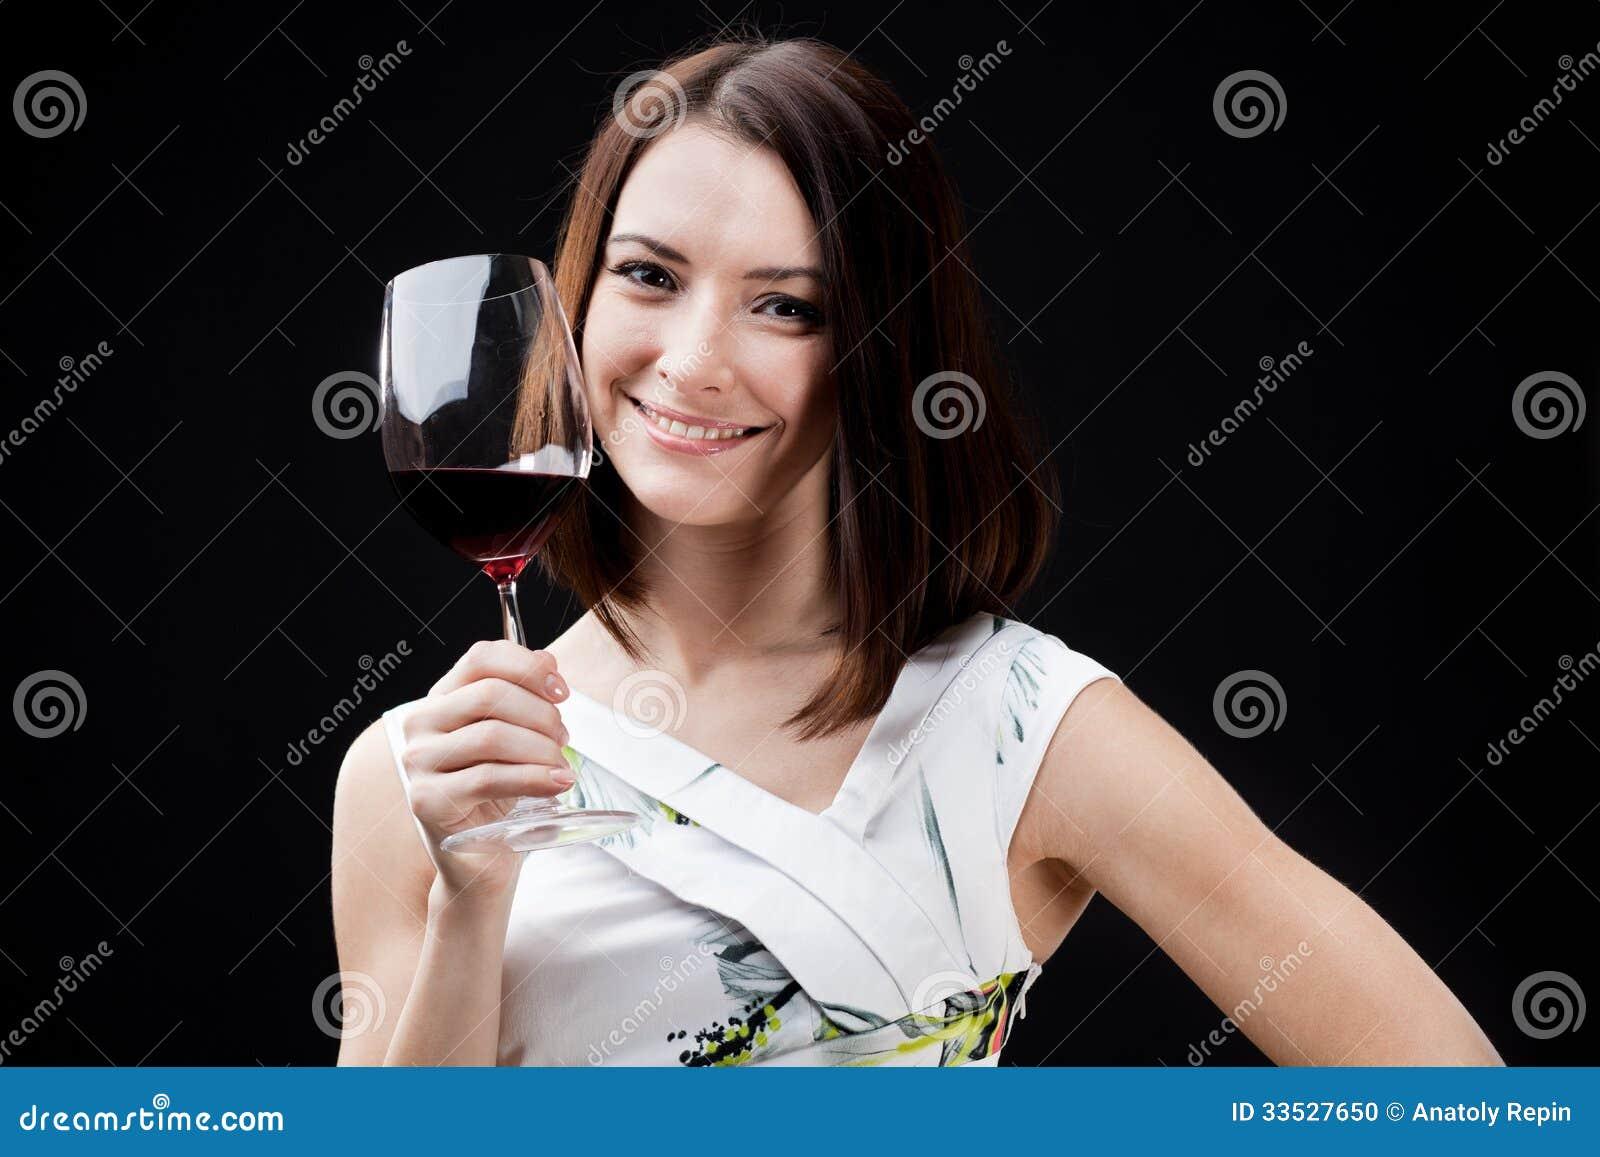 Woman Holding Wine Glass Stock Photo - Image: 33527650